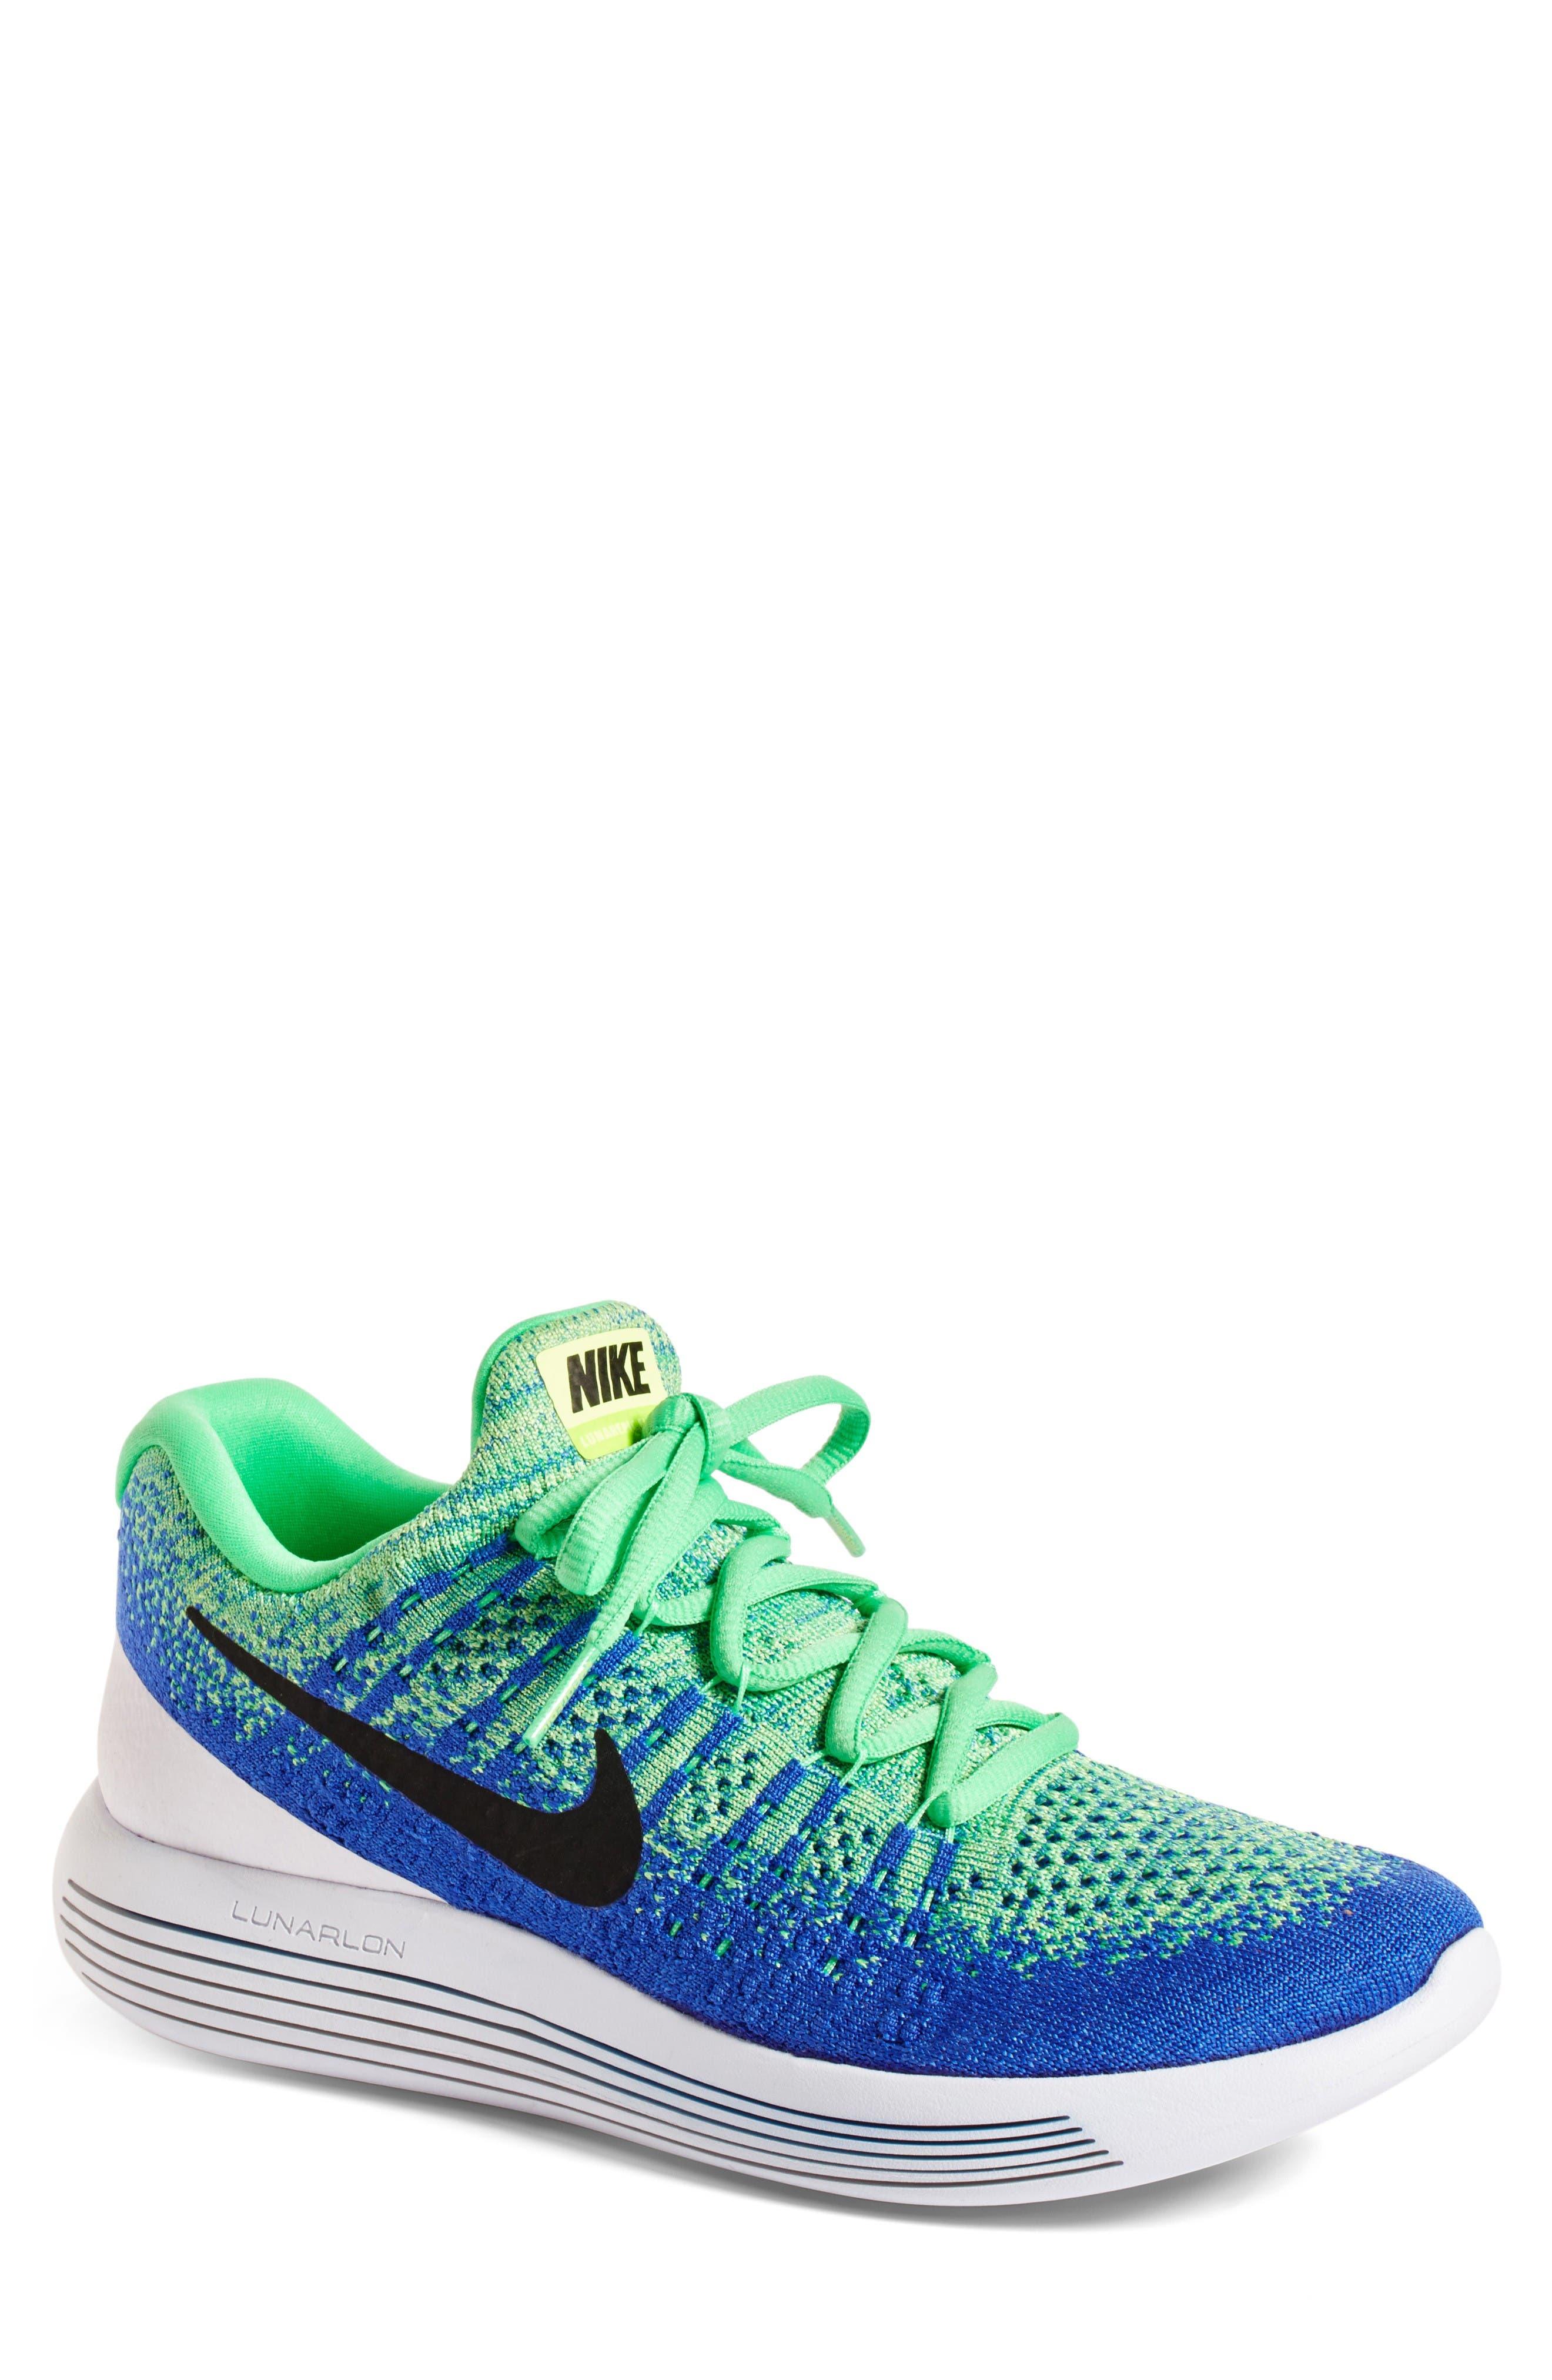 Flyknit 2 LunarEpic Running Shoe,                         Main,                         color, Electro Green/ Black/ Blue